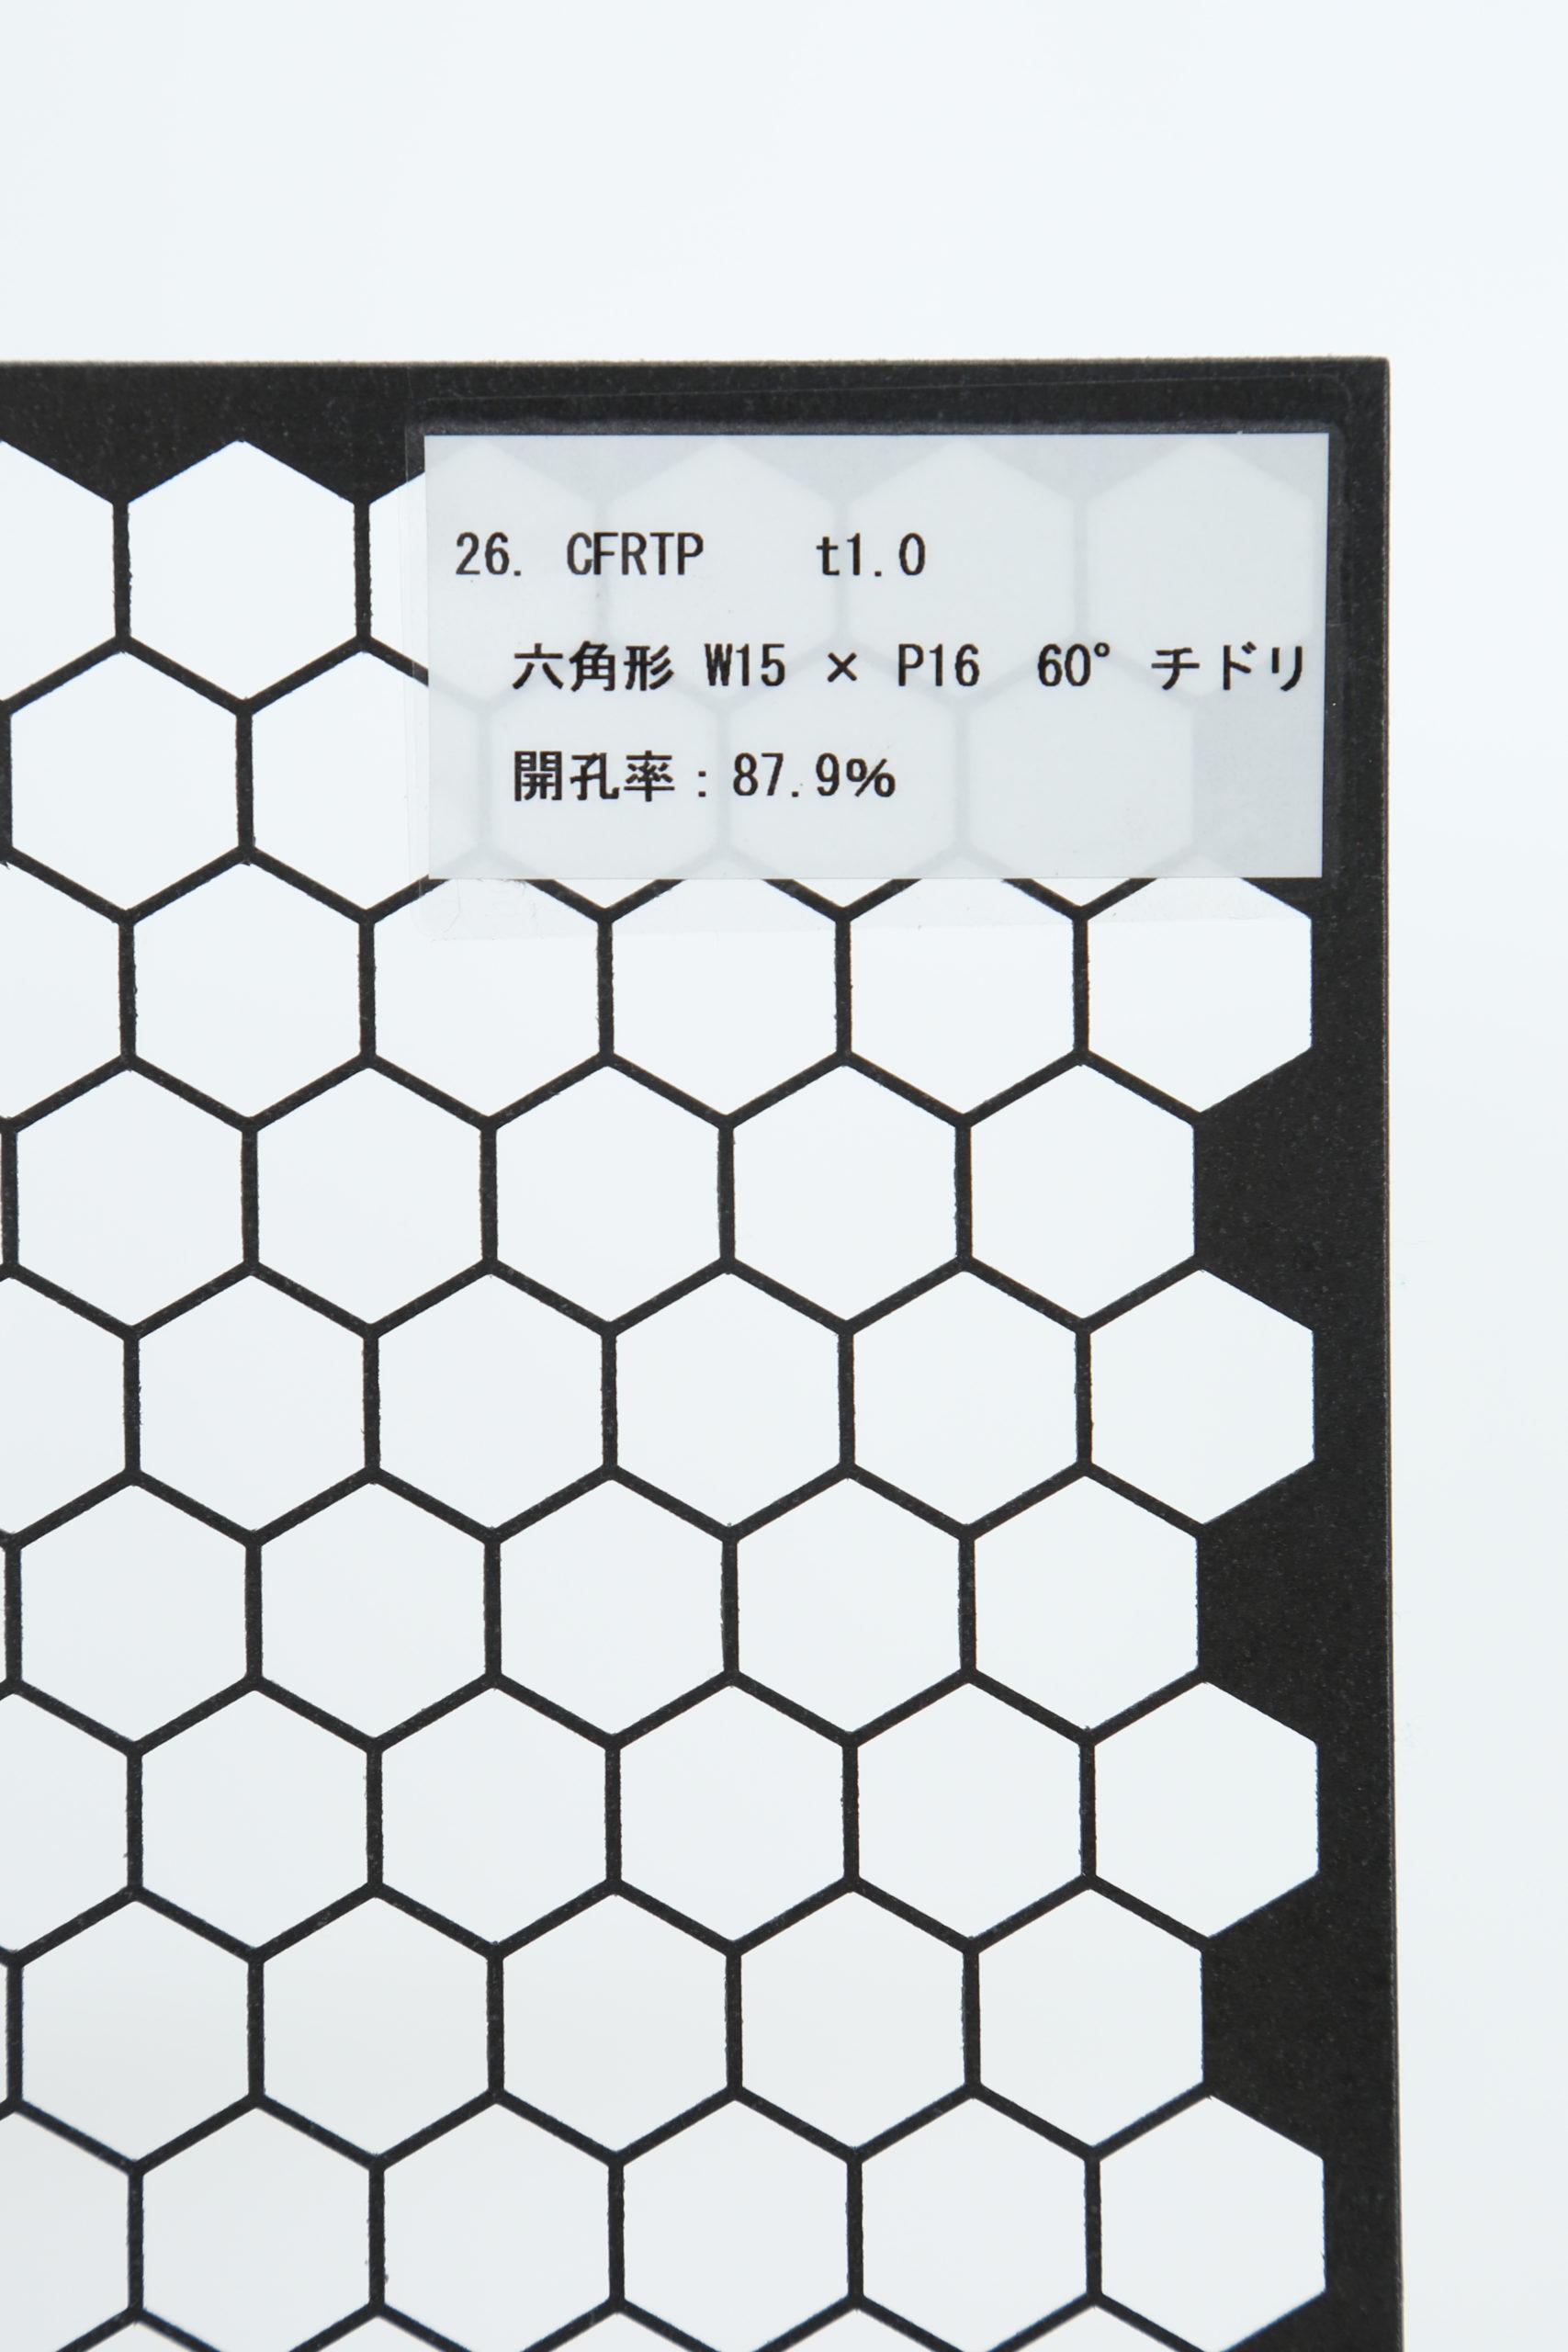 CFRTP t1.0 六角形 W15×P16 60°チドリ 開口率:87.9%